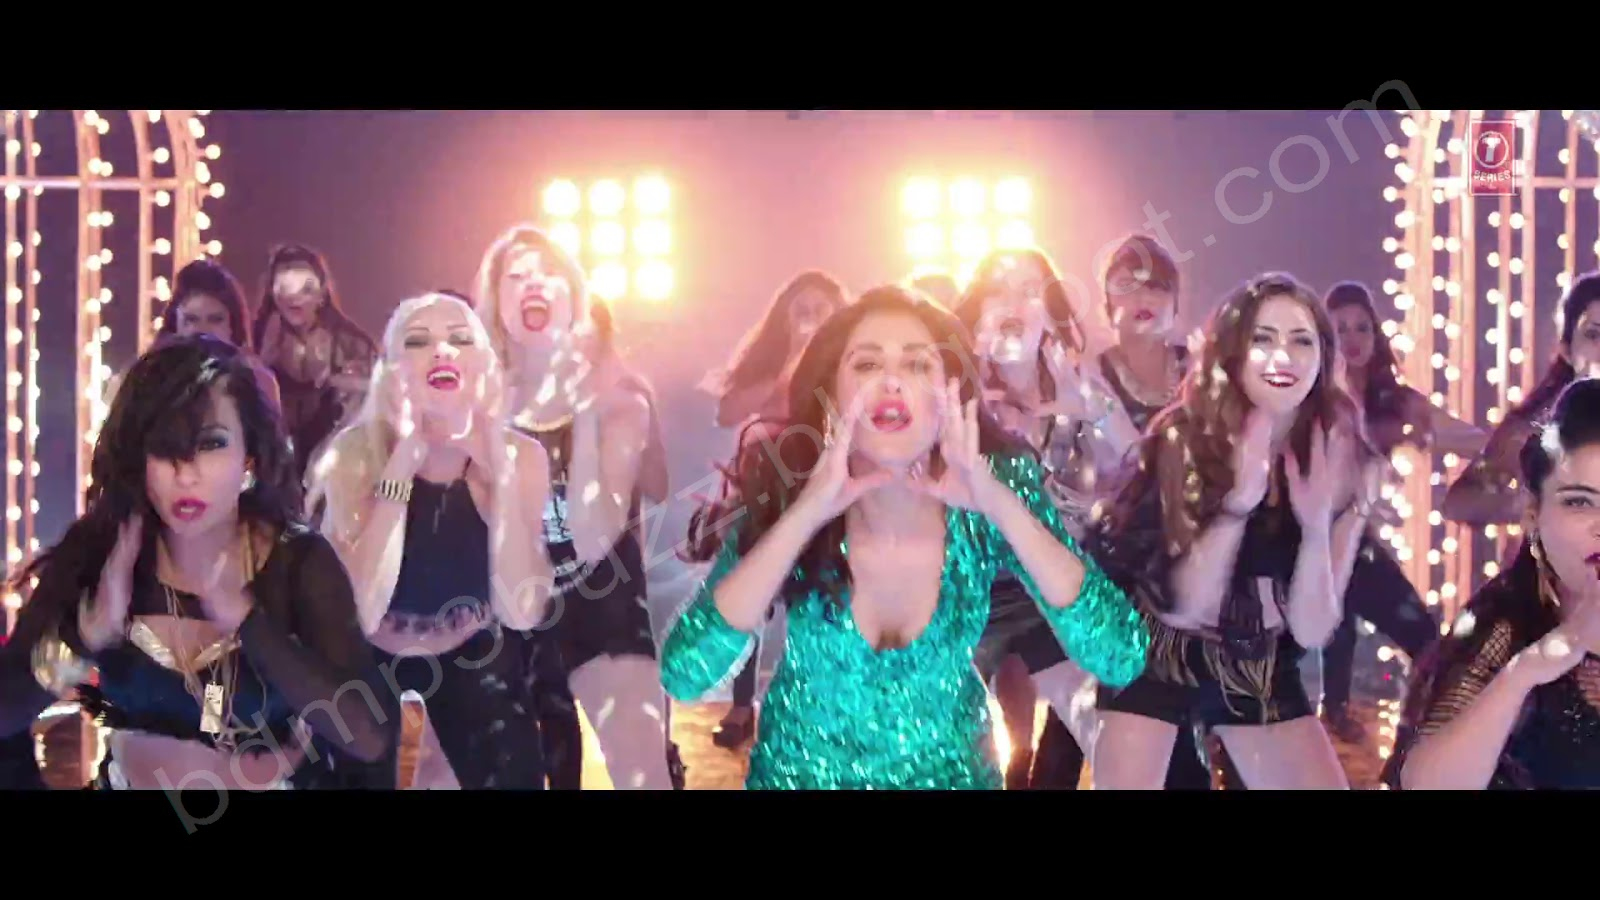 free download videos songs tamil